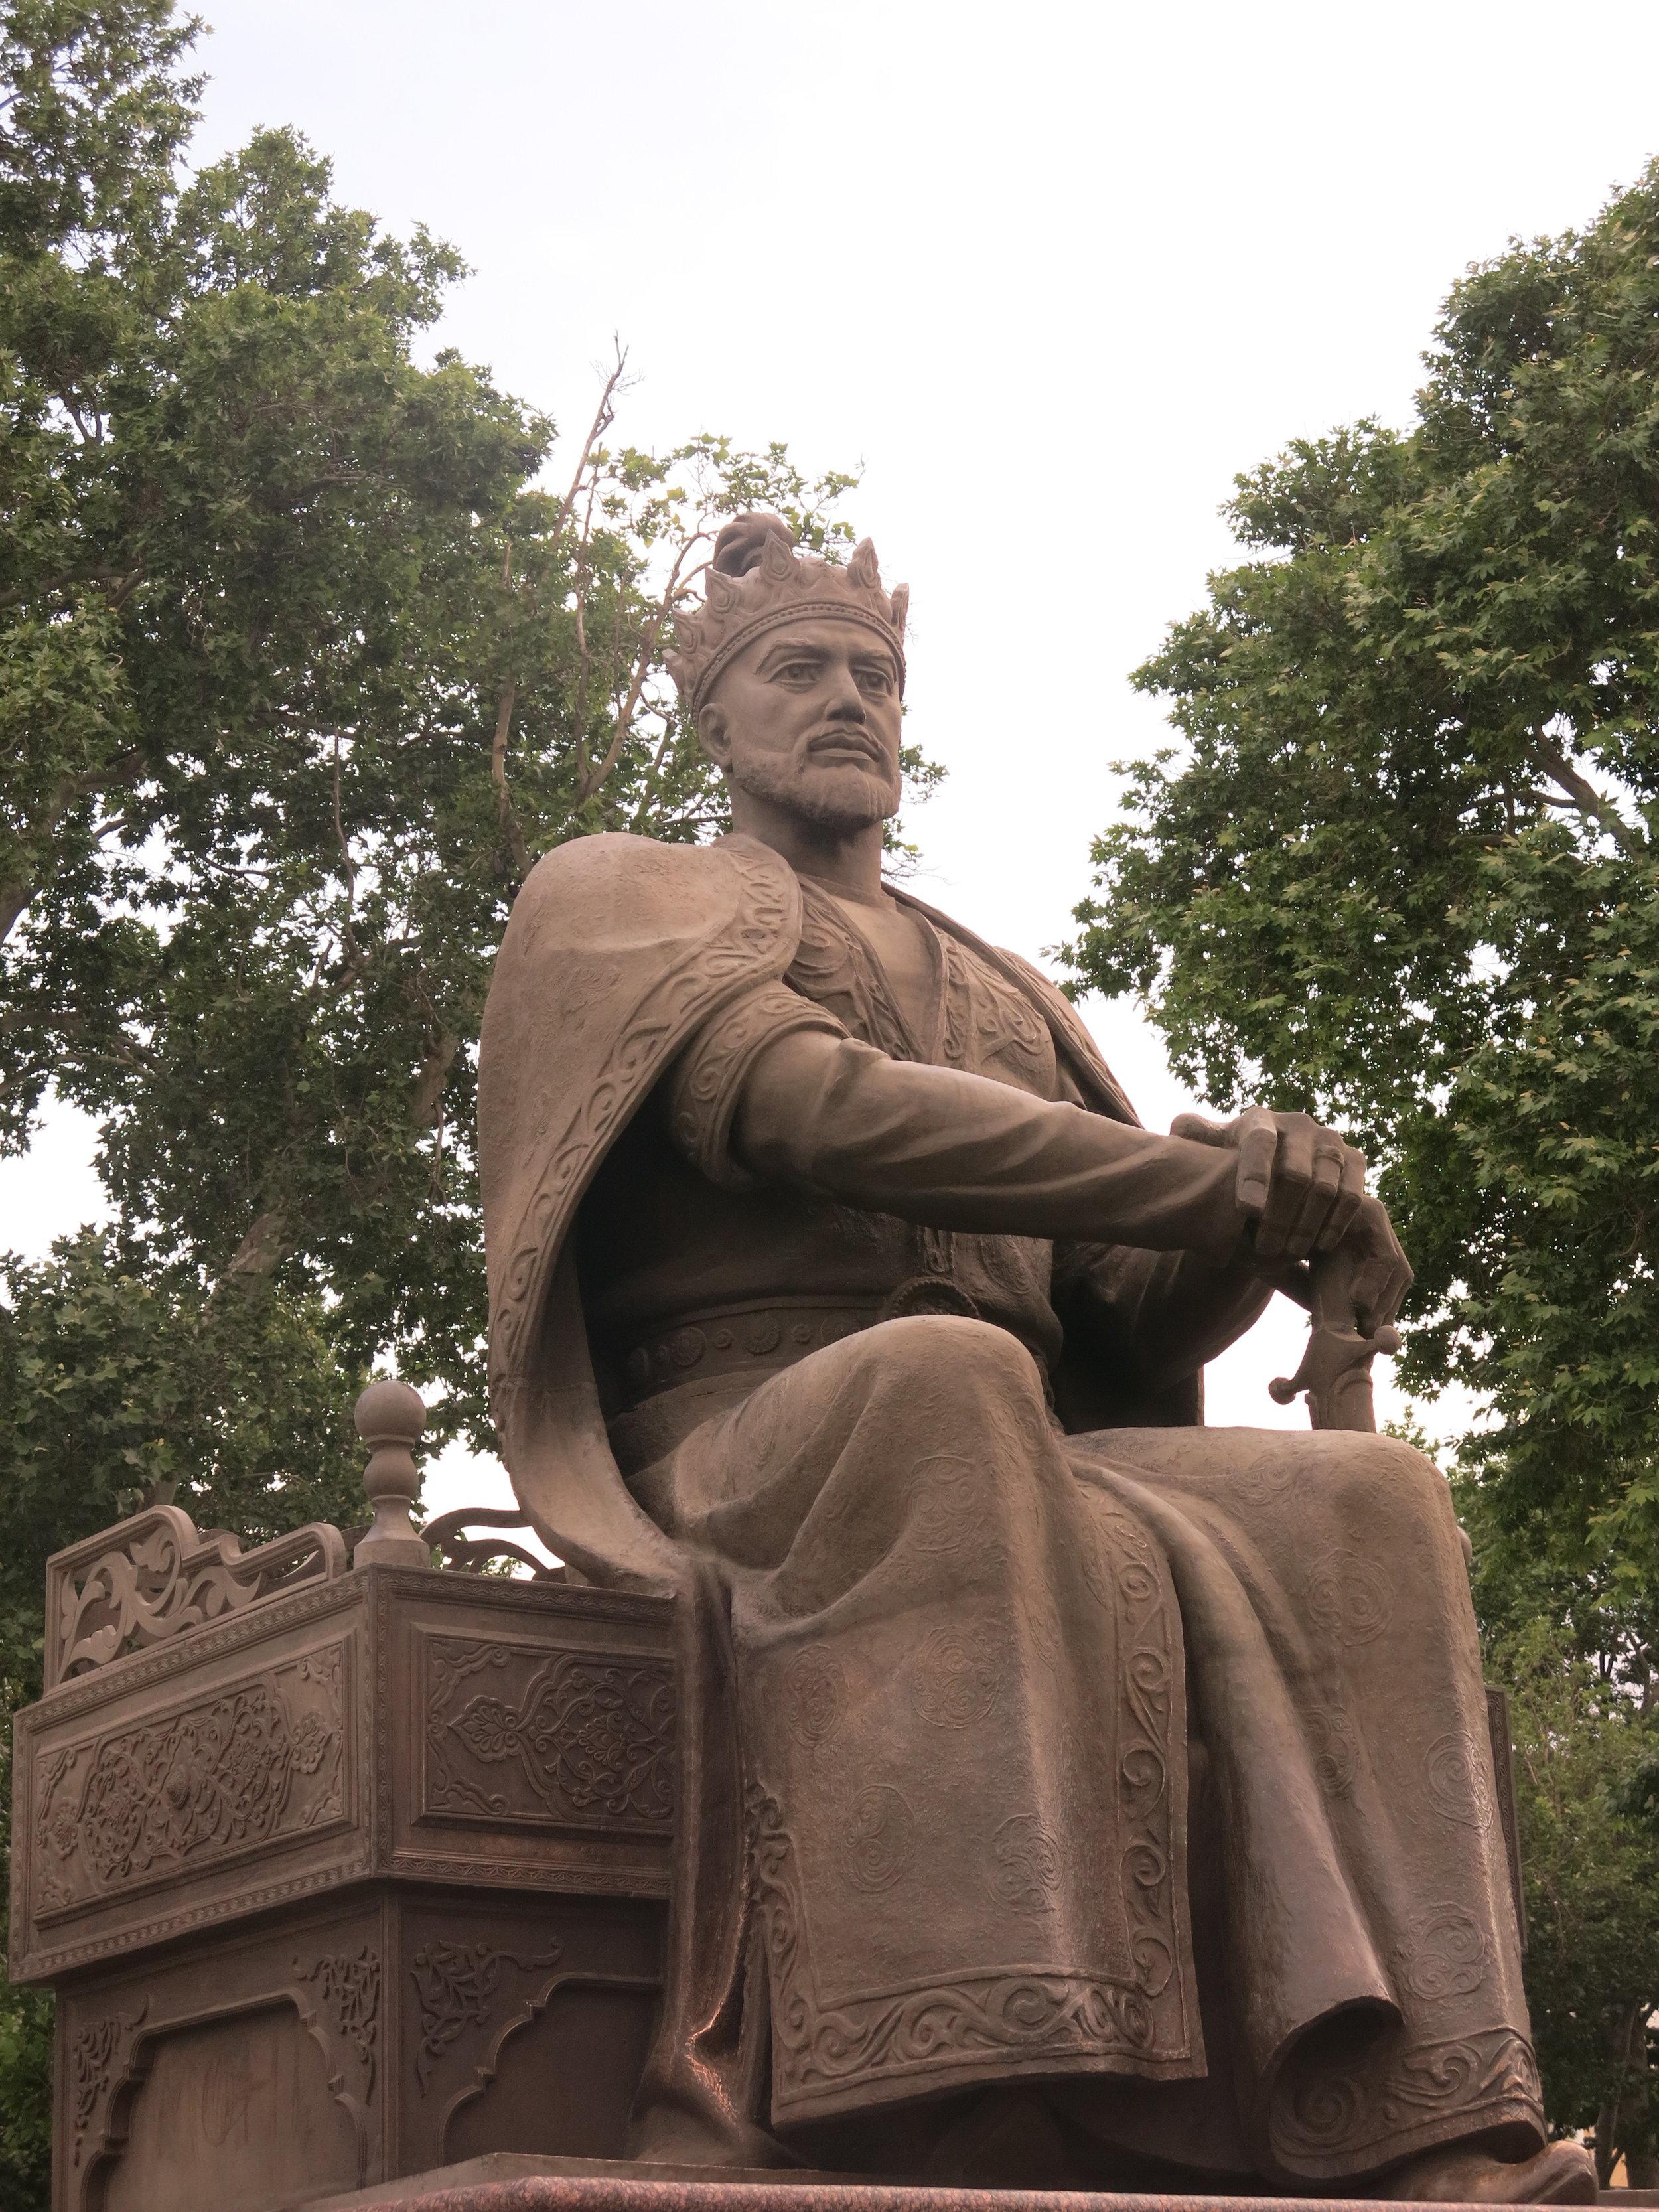 A statue of Amir Temur (Tamerlane) next to a modern boulevard